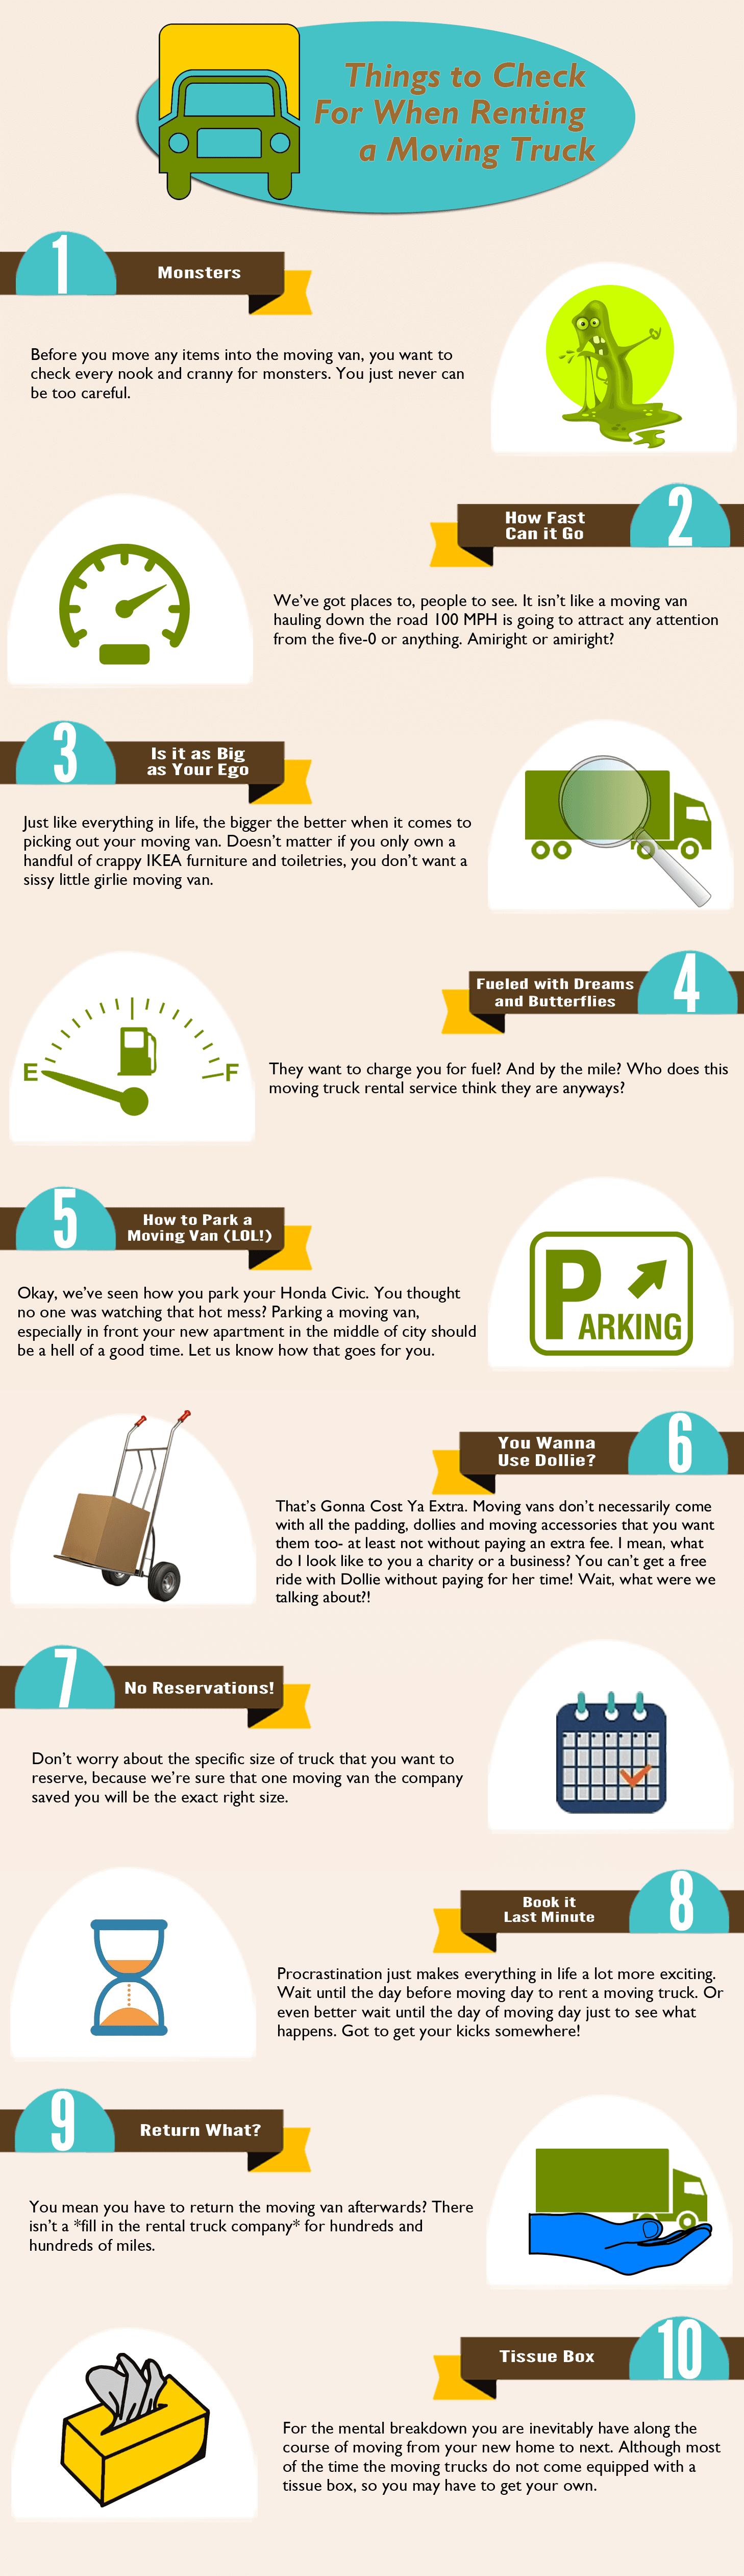 Funny Checklist For Rental Trucks